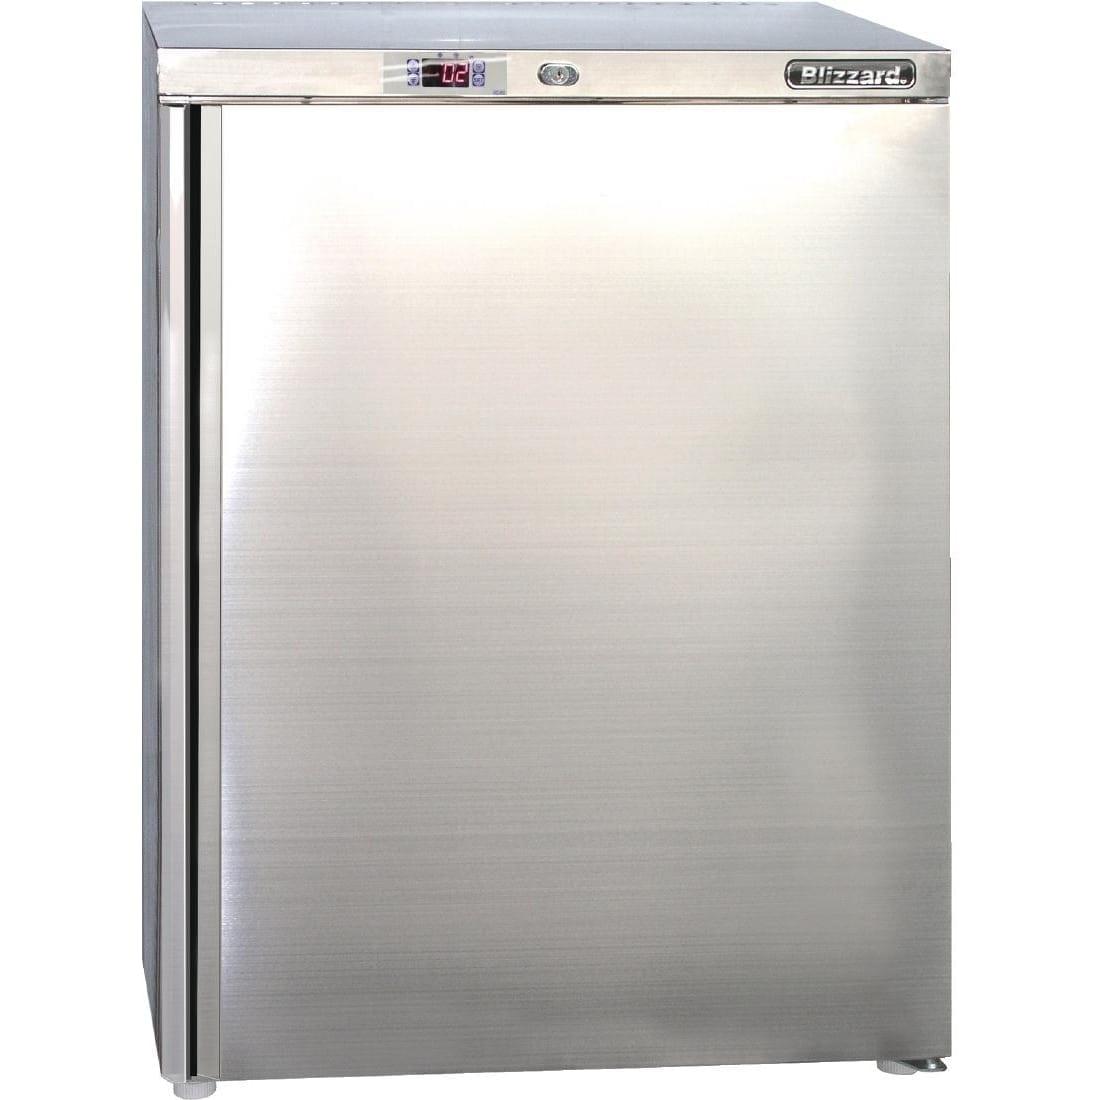 Blizzard Undercounter Refrigerator St/St - 140Ltr (Direct)-0